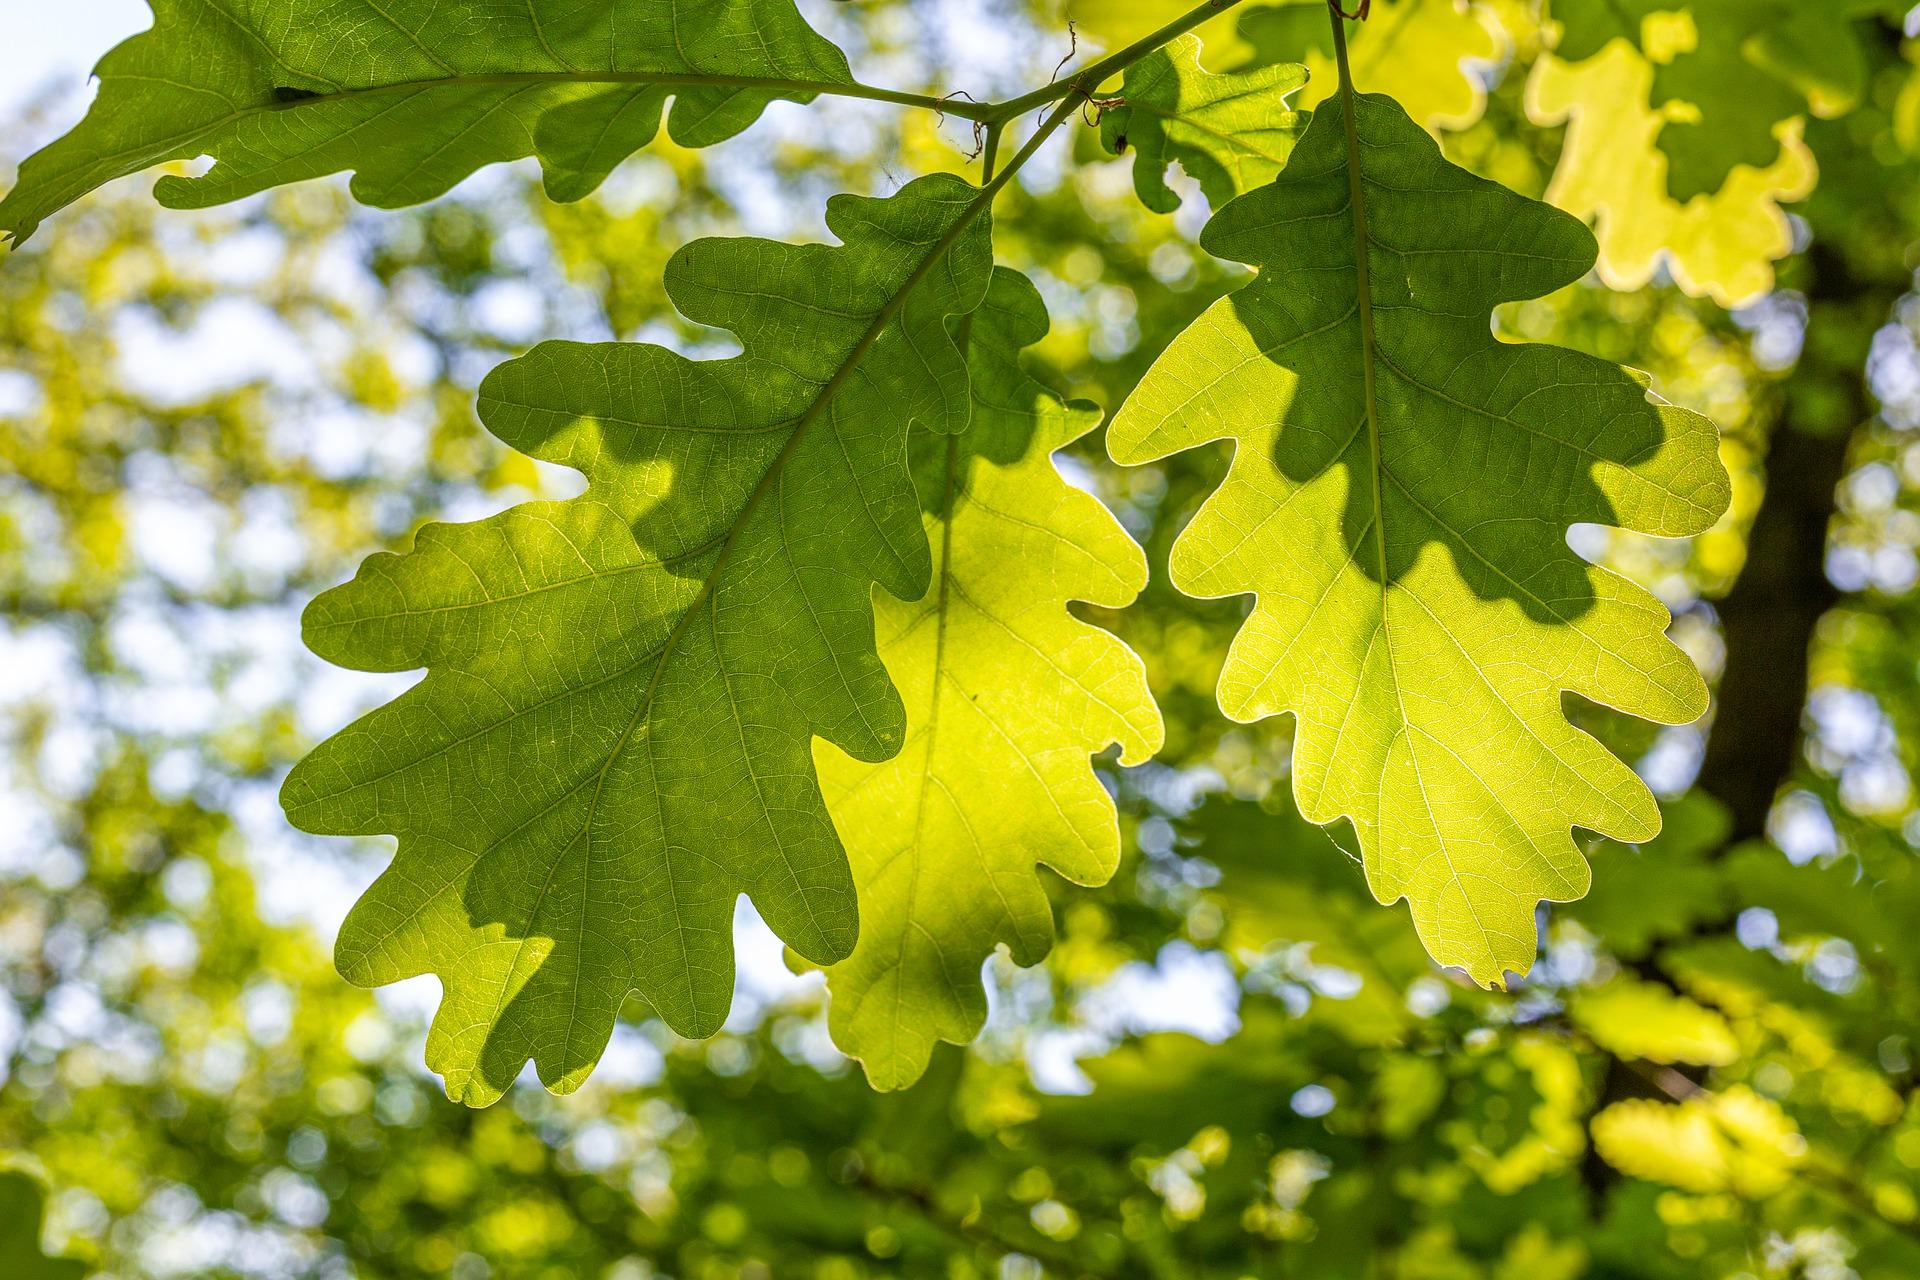 tree leaf identification; Oak leaves